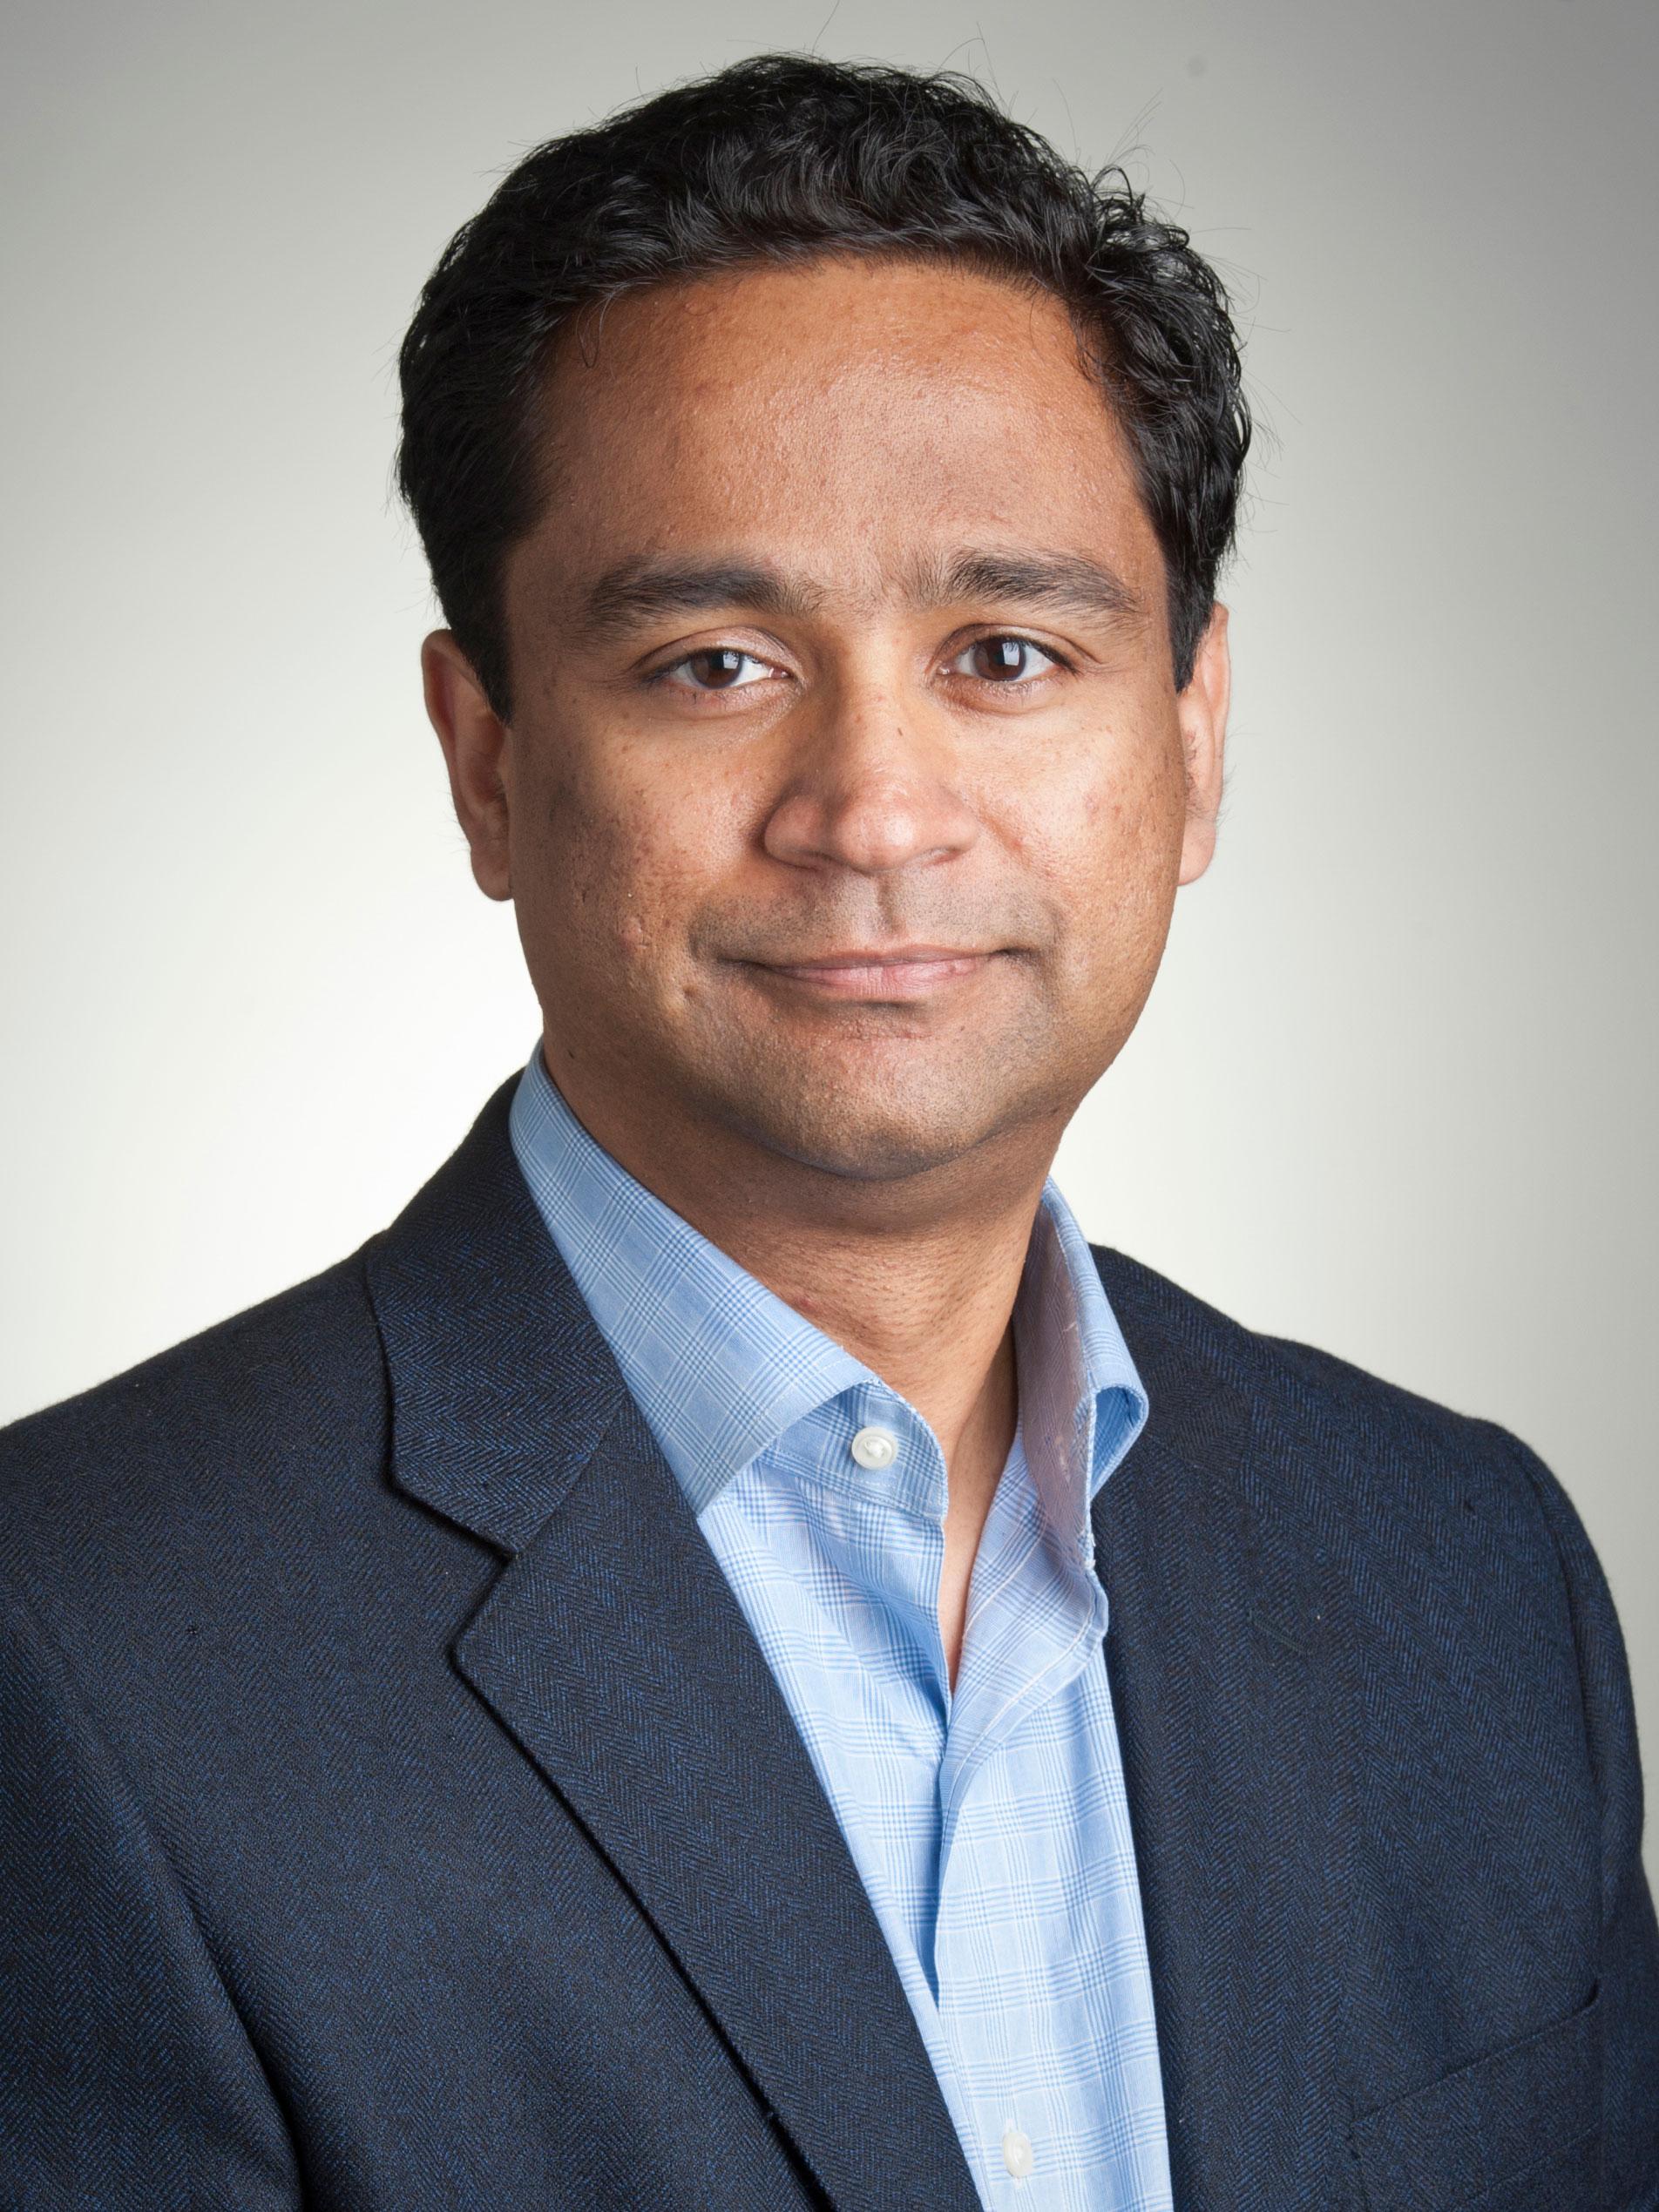 Anand Asthagiri